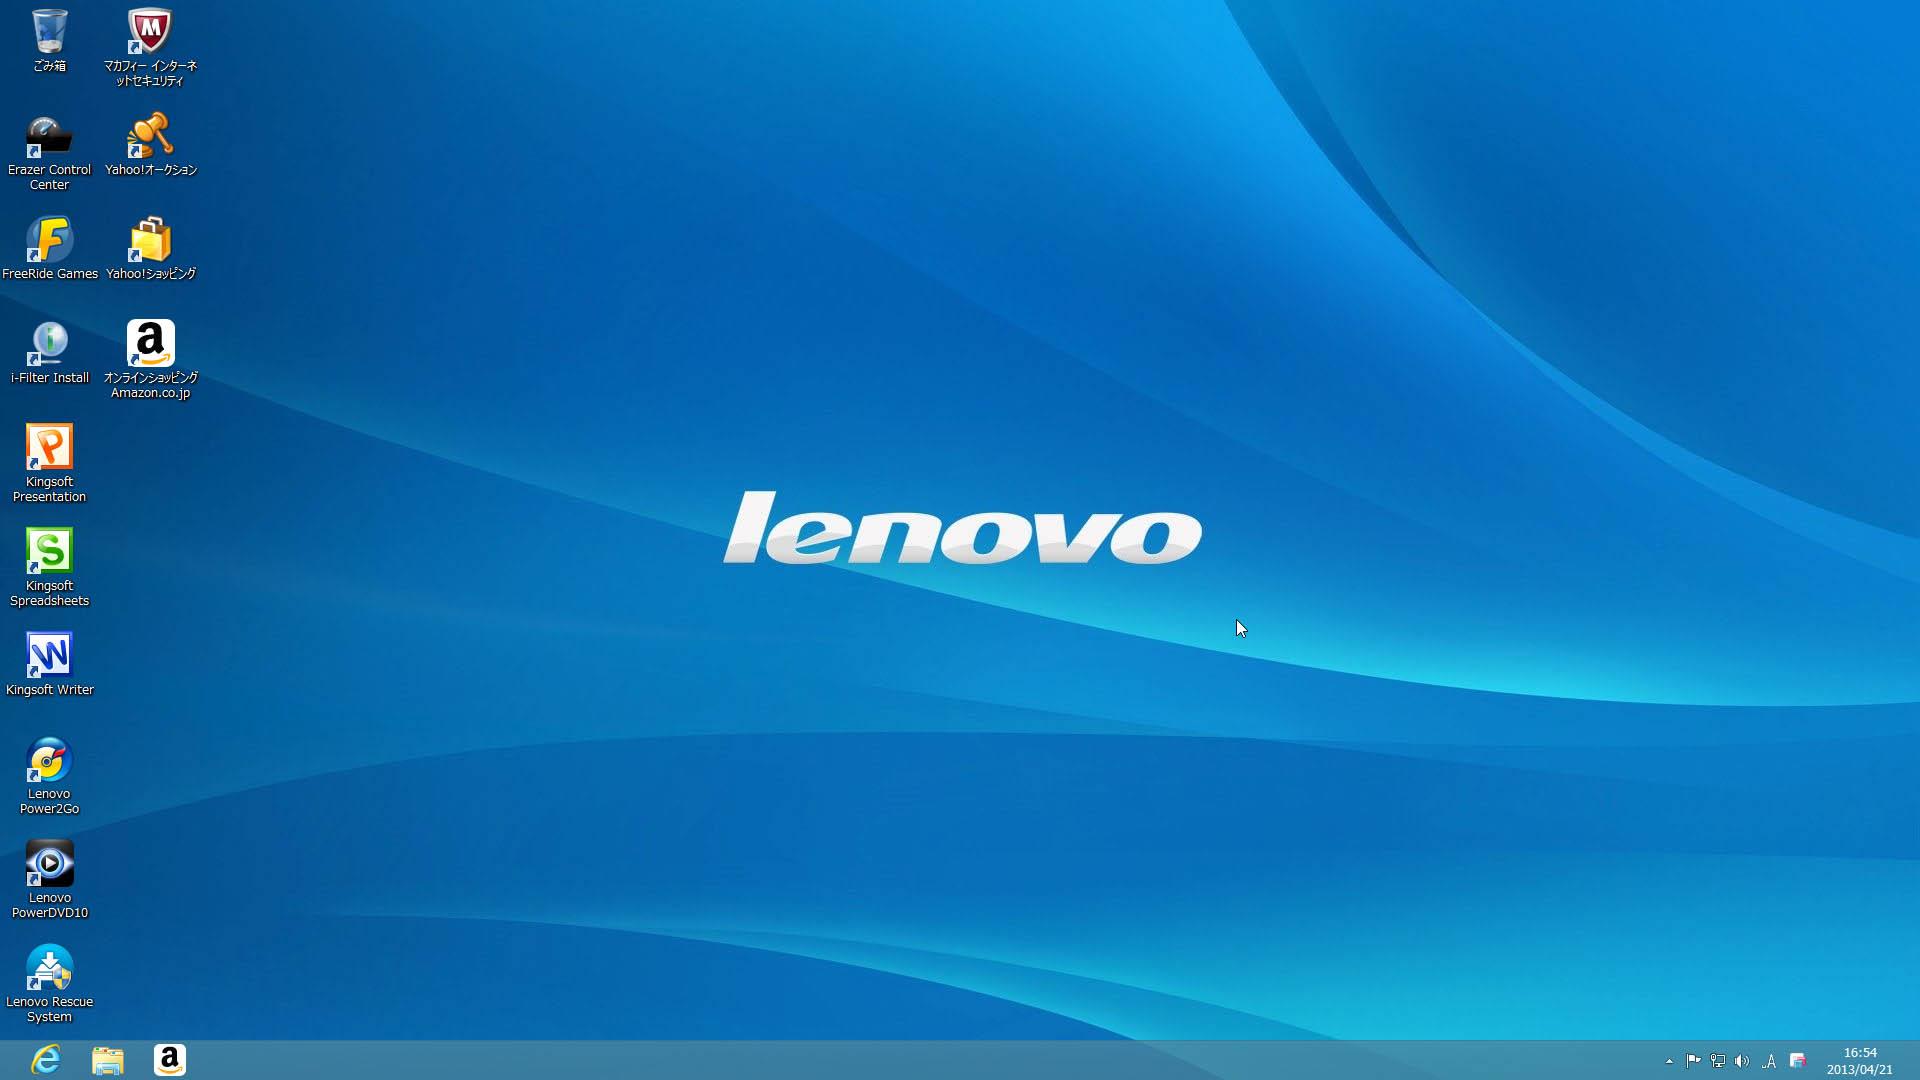 Lenovo Wallpaper 1920x1080 Lenovo Desktop Wallpaper 1920x1080